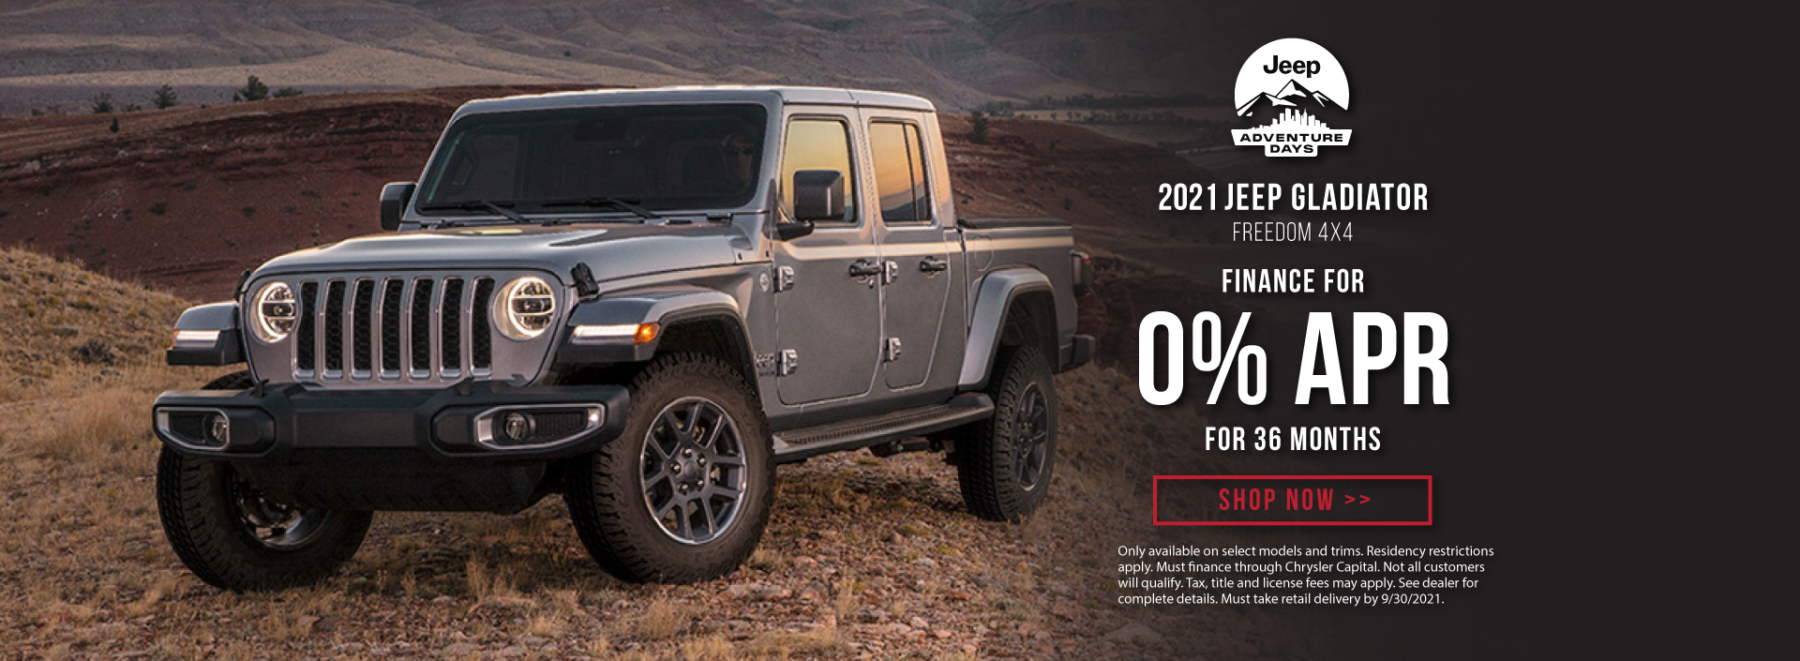 2021 Jeep Gladiator Offer